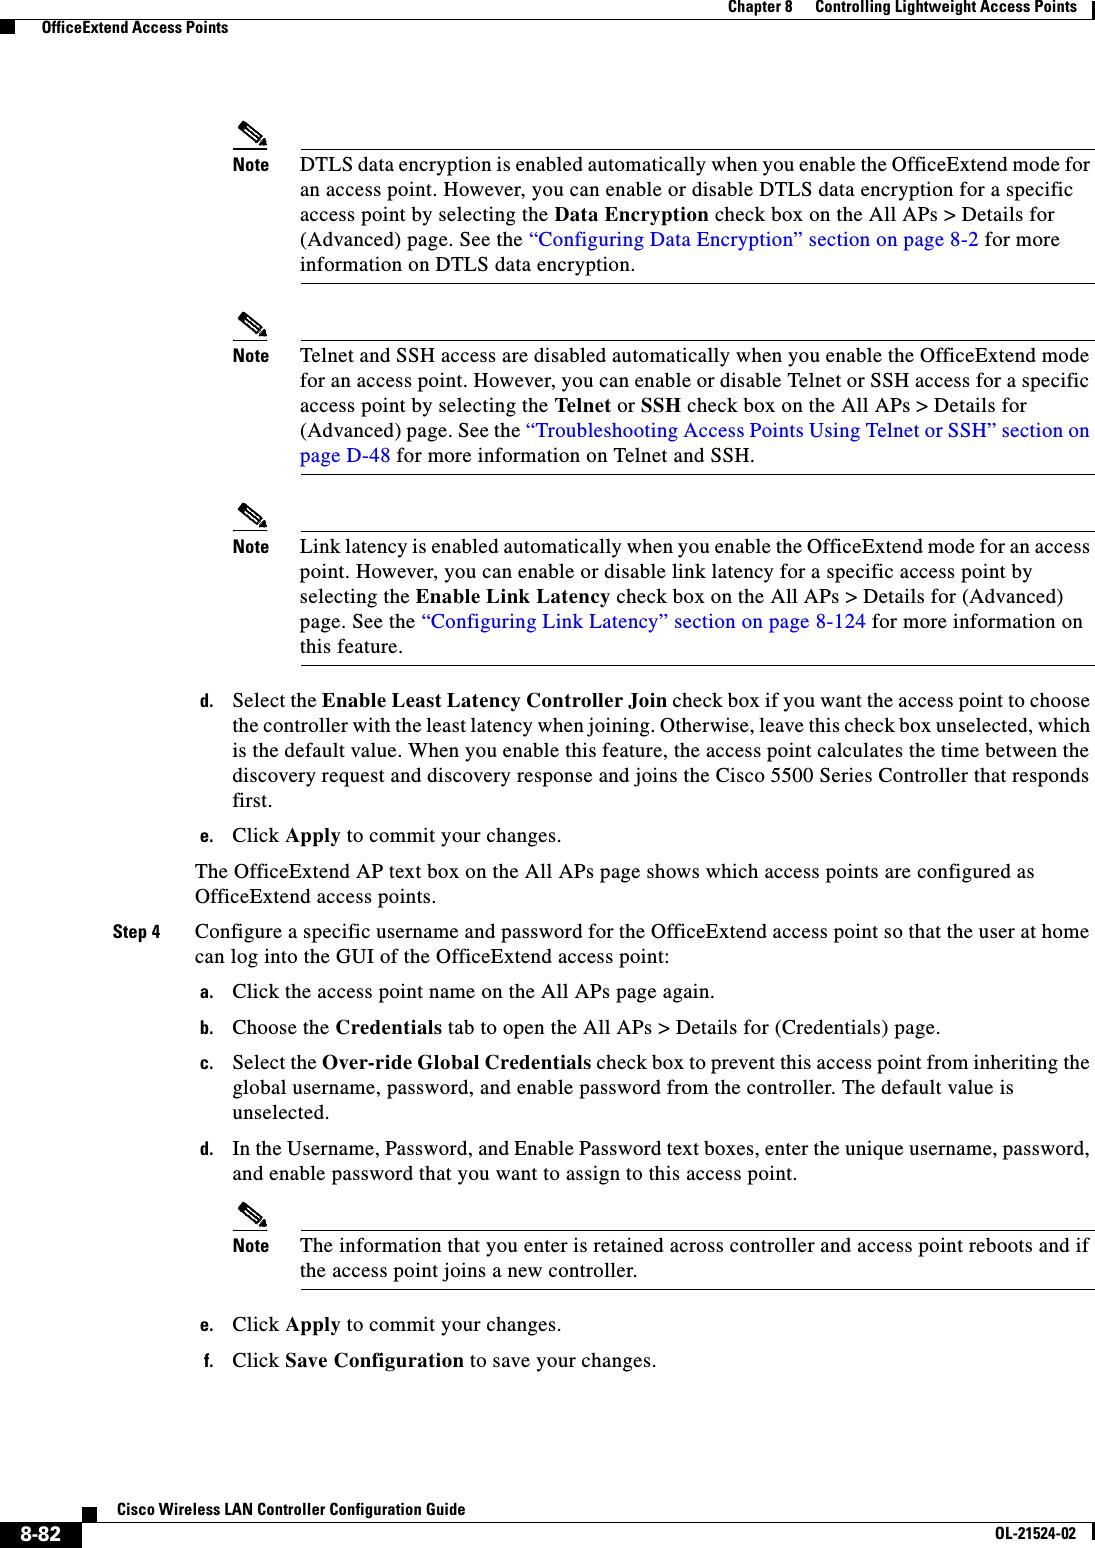 cisco 1600 access point configuration guide